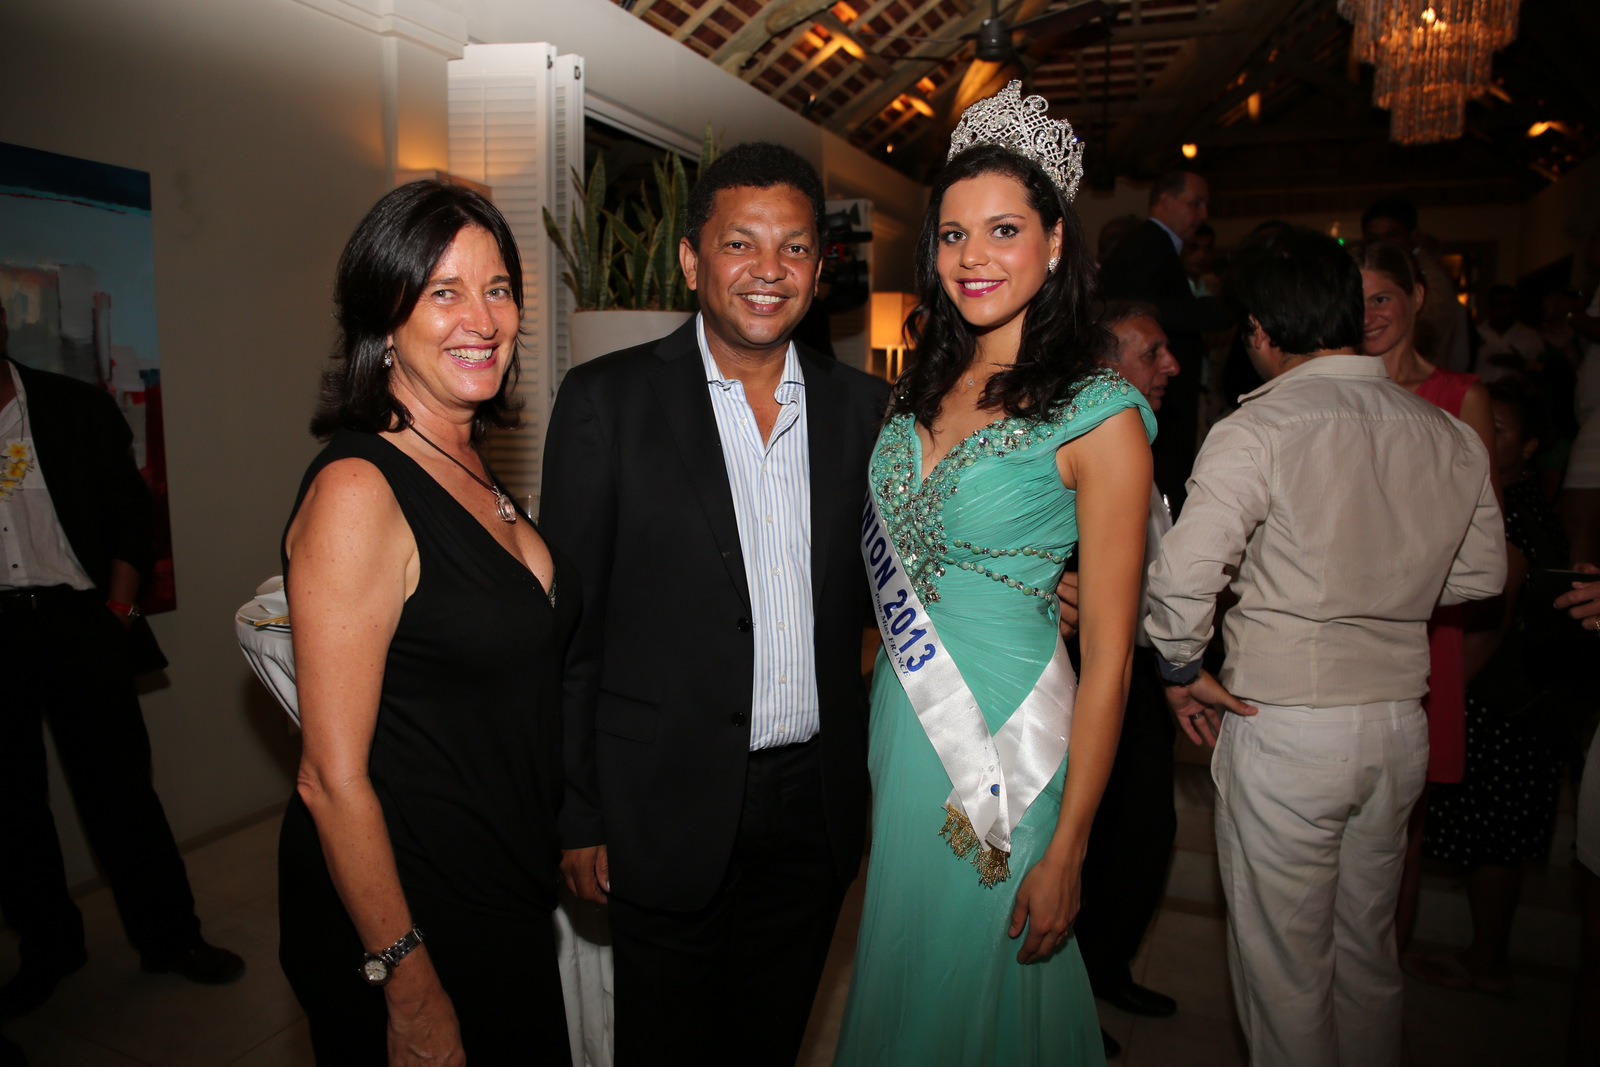 Irene Legris de British Airways,  Robert Desvaux, et Miss Réunion